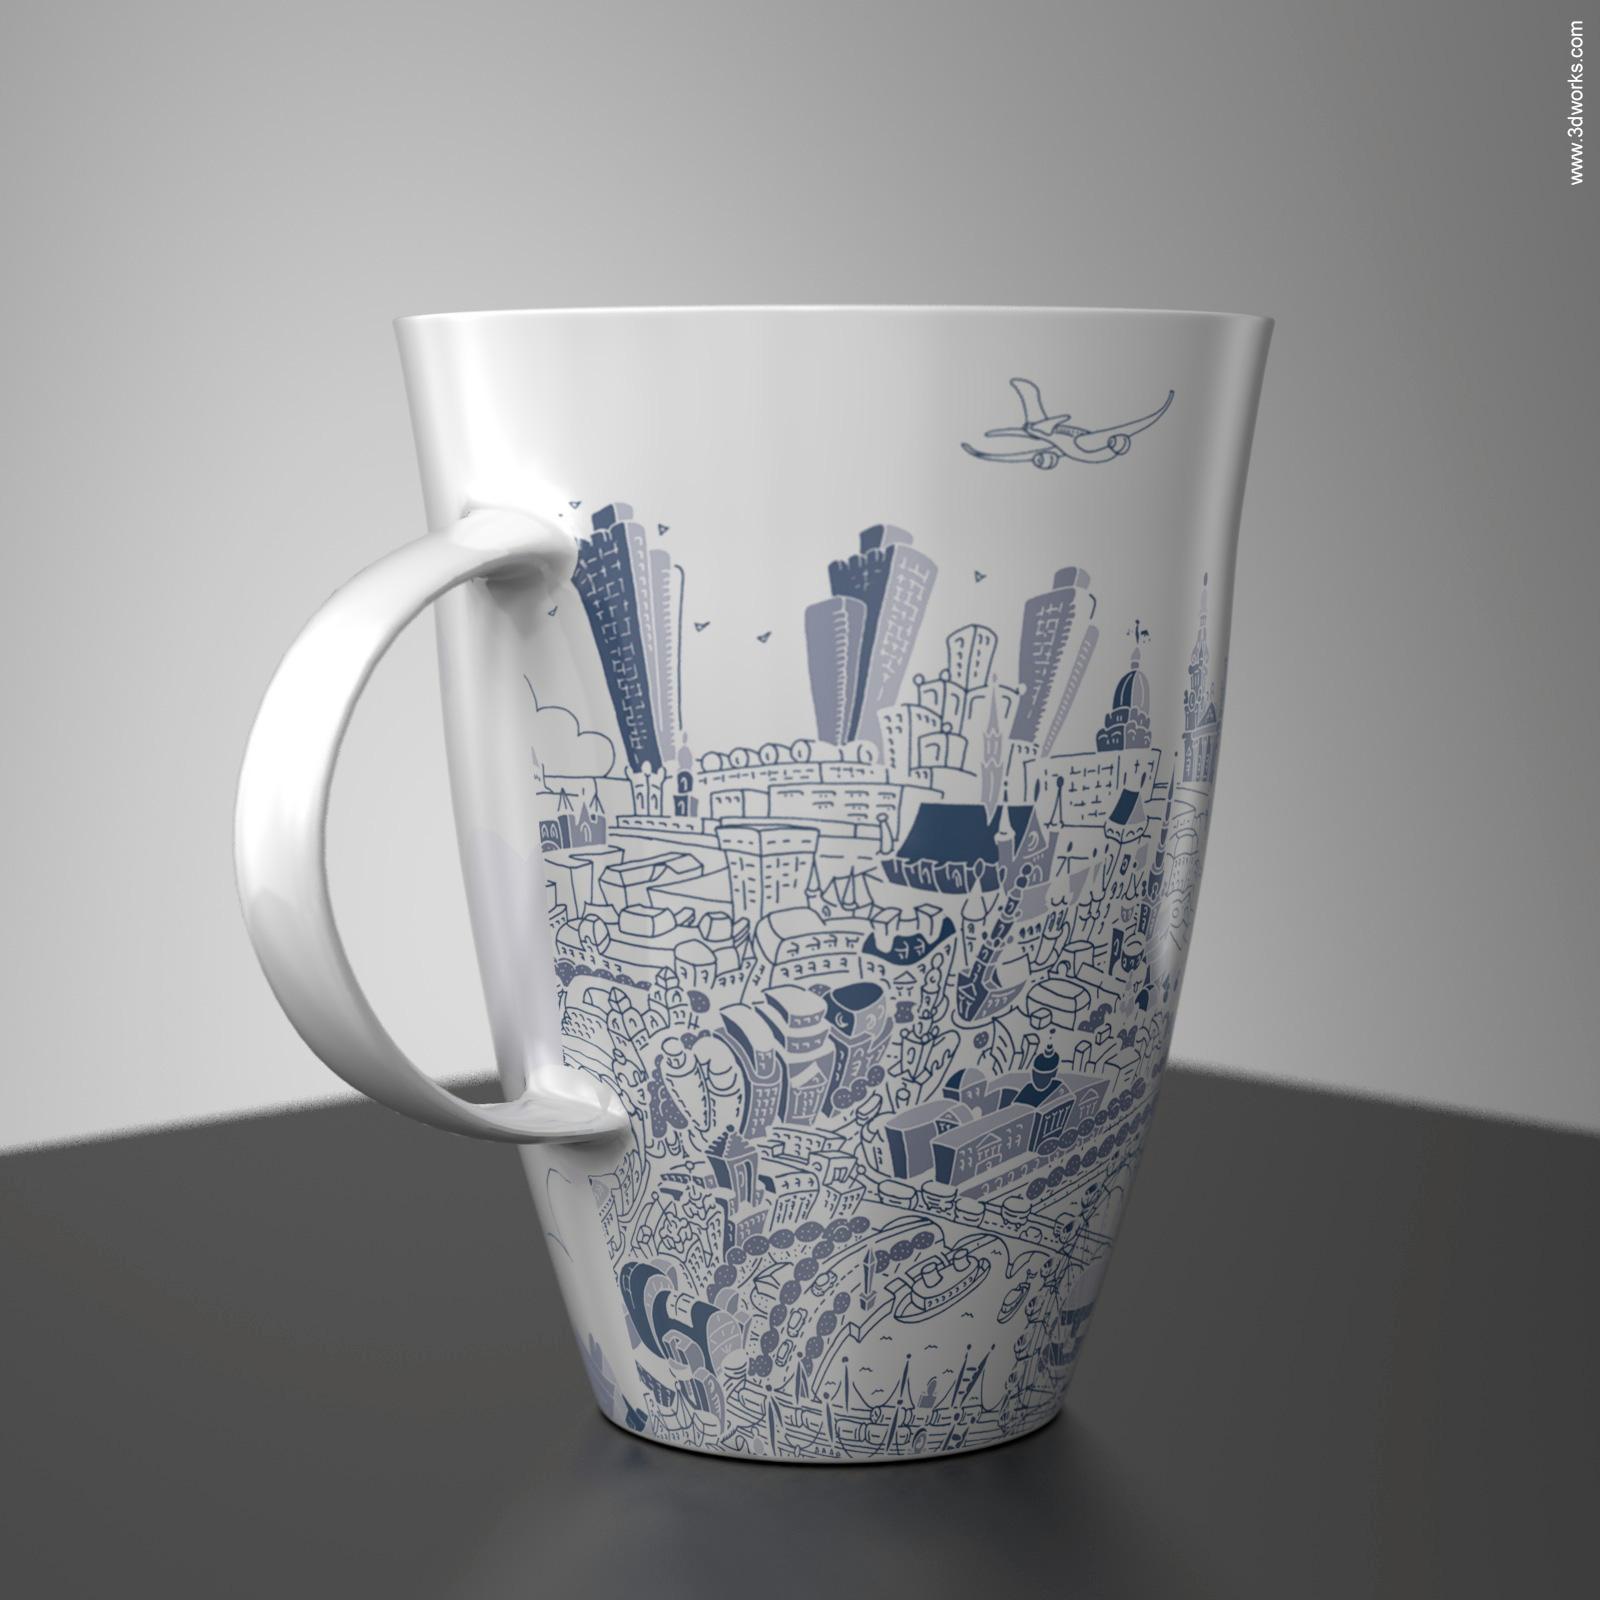 Produktvisualisierung, Bone China Visualisation - Artyglobe Limited / Hartwig Braun